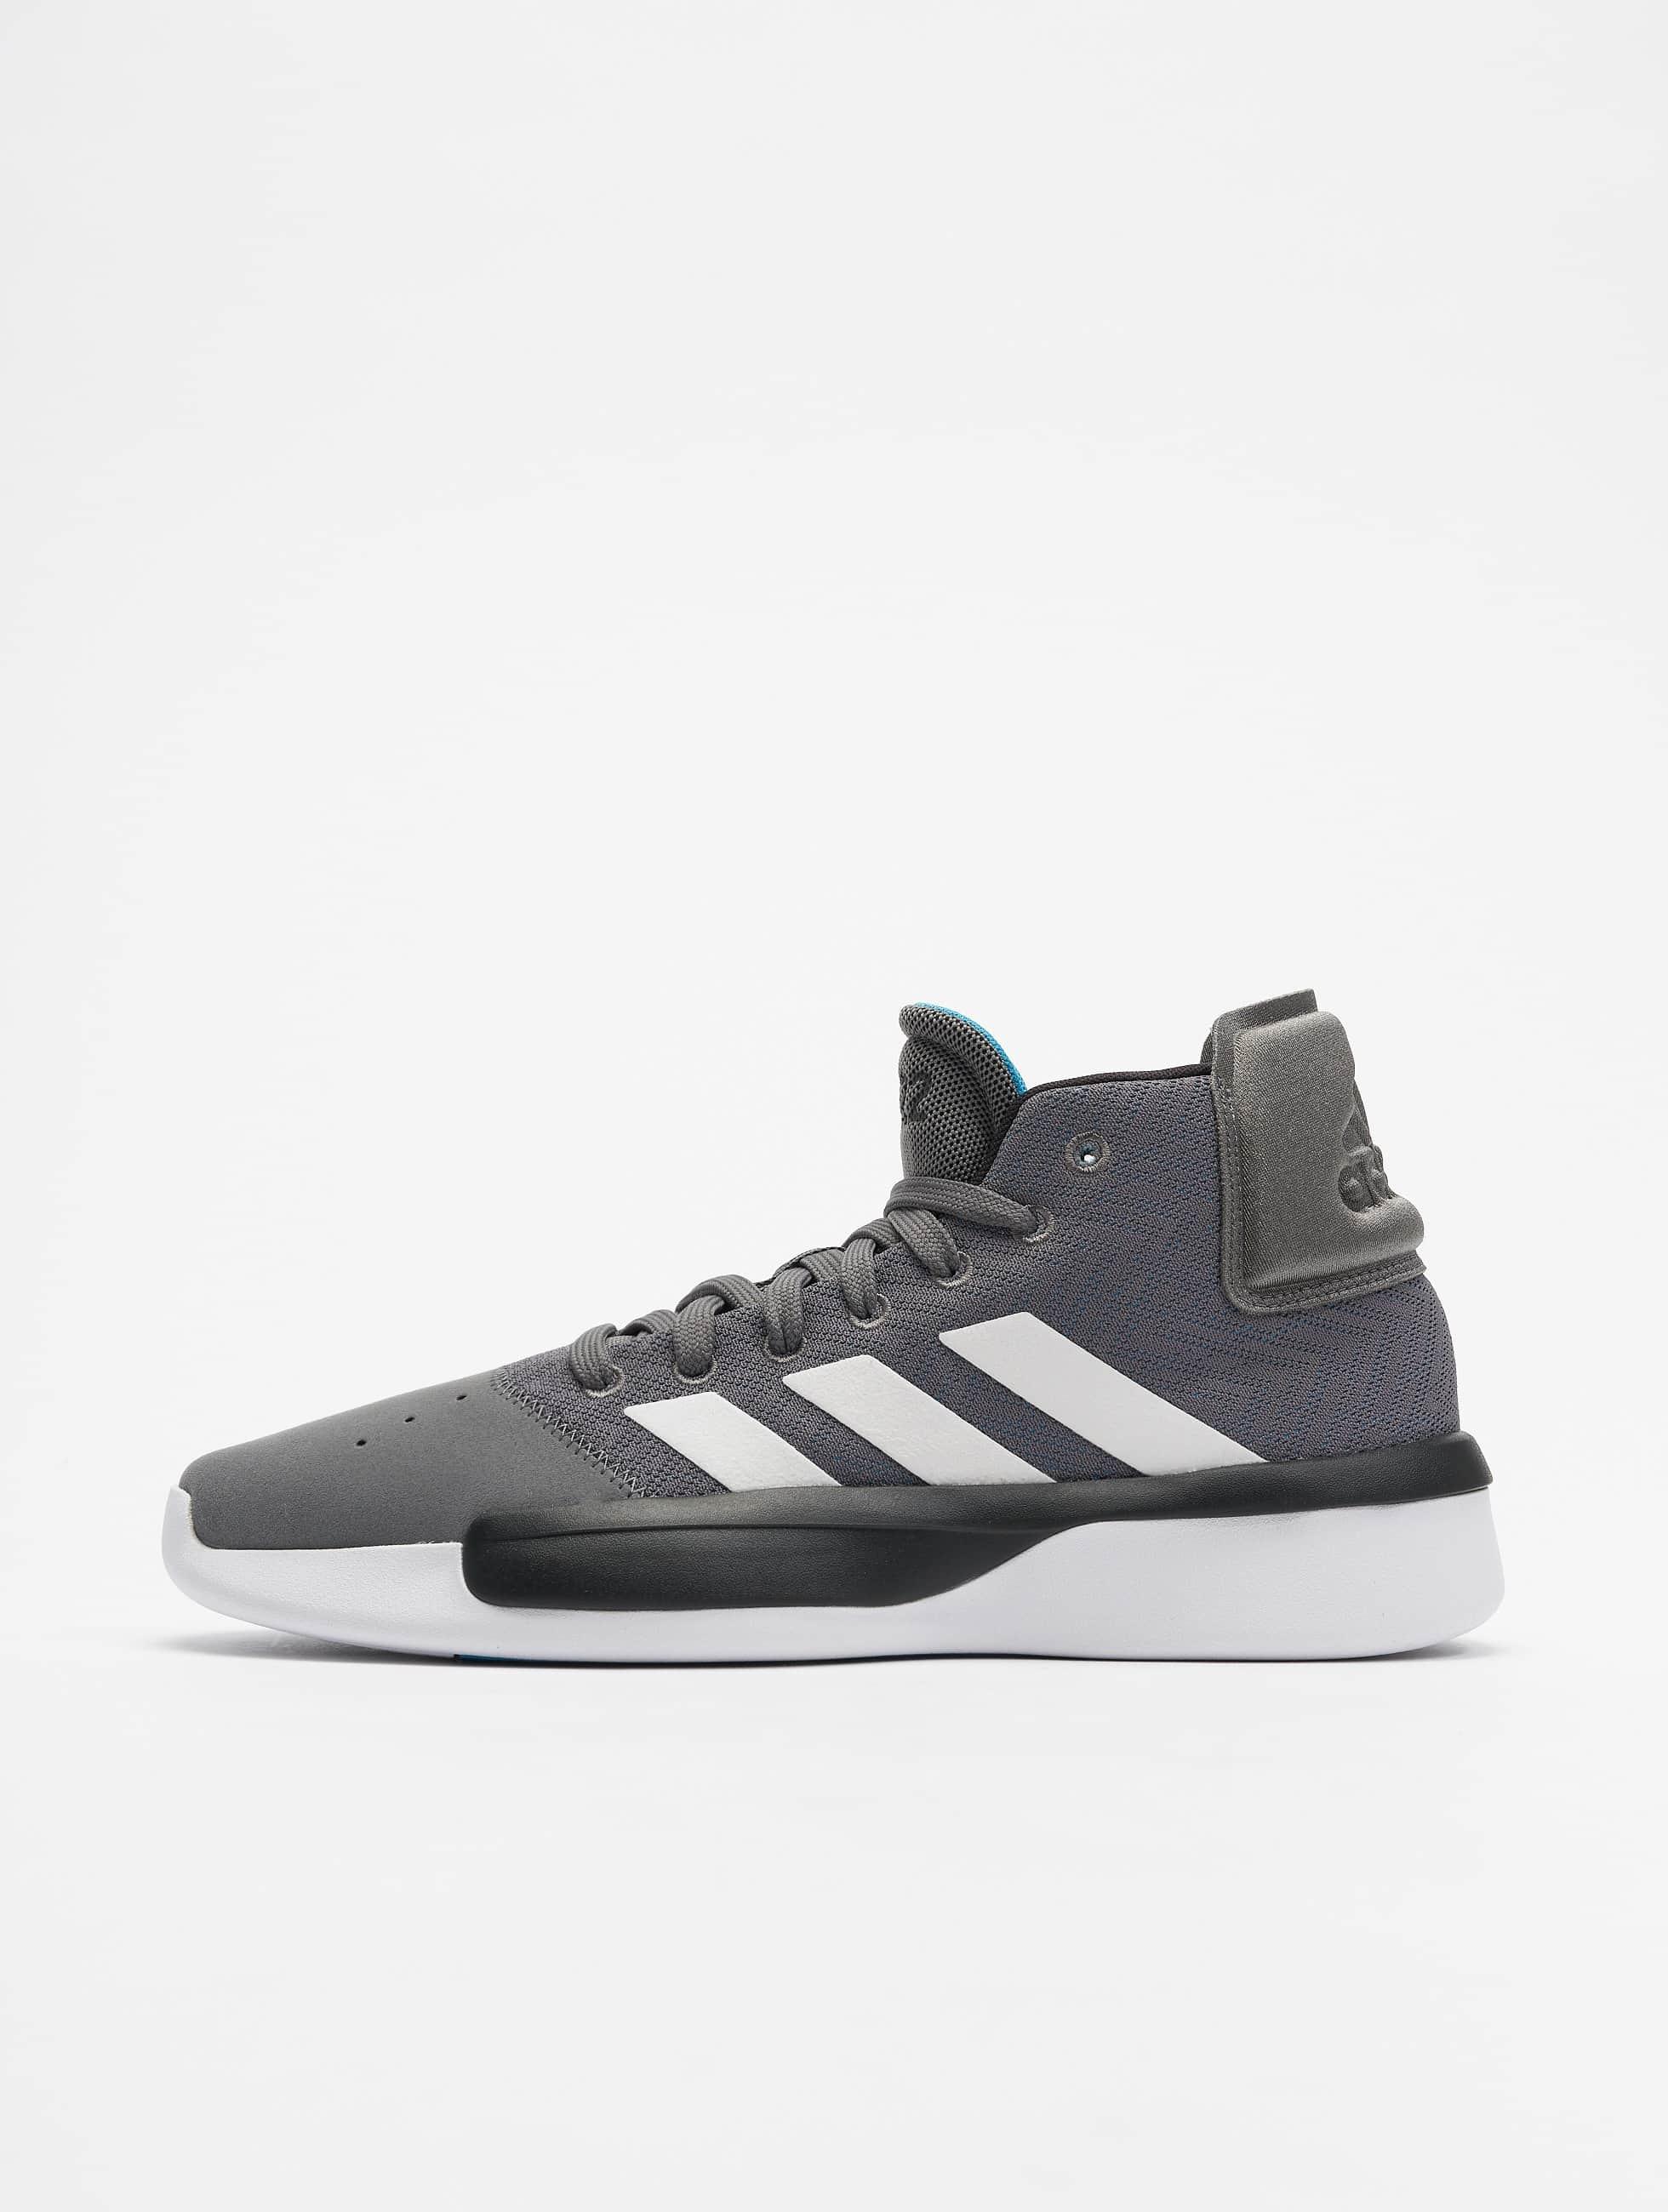 adidas Pro Adversary Basketball Shoes Grey FourFtw WhiteSHOCYA